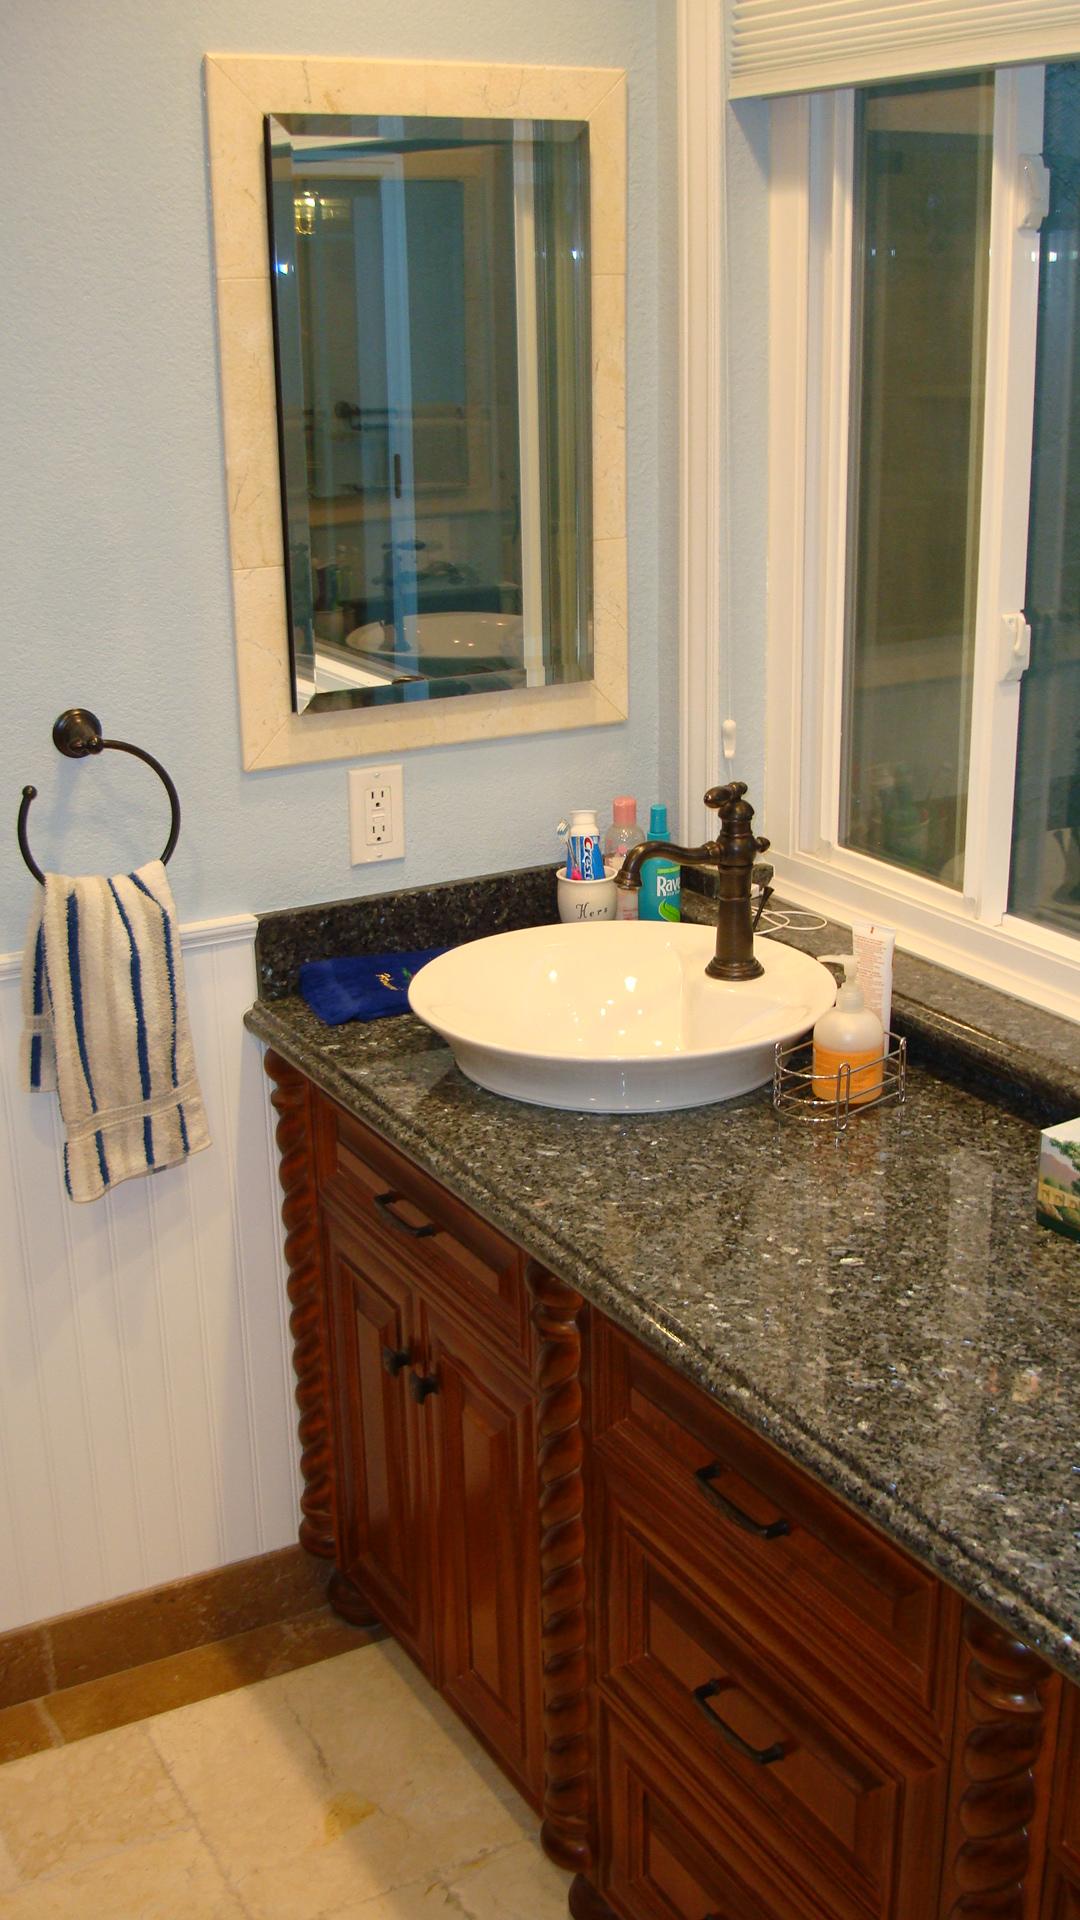 Bathroom Remodeling San Jose Ca Richmond Ave San Jose CA Master - Bathroom remodel san jose ca